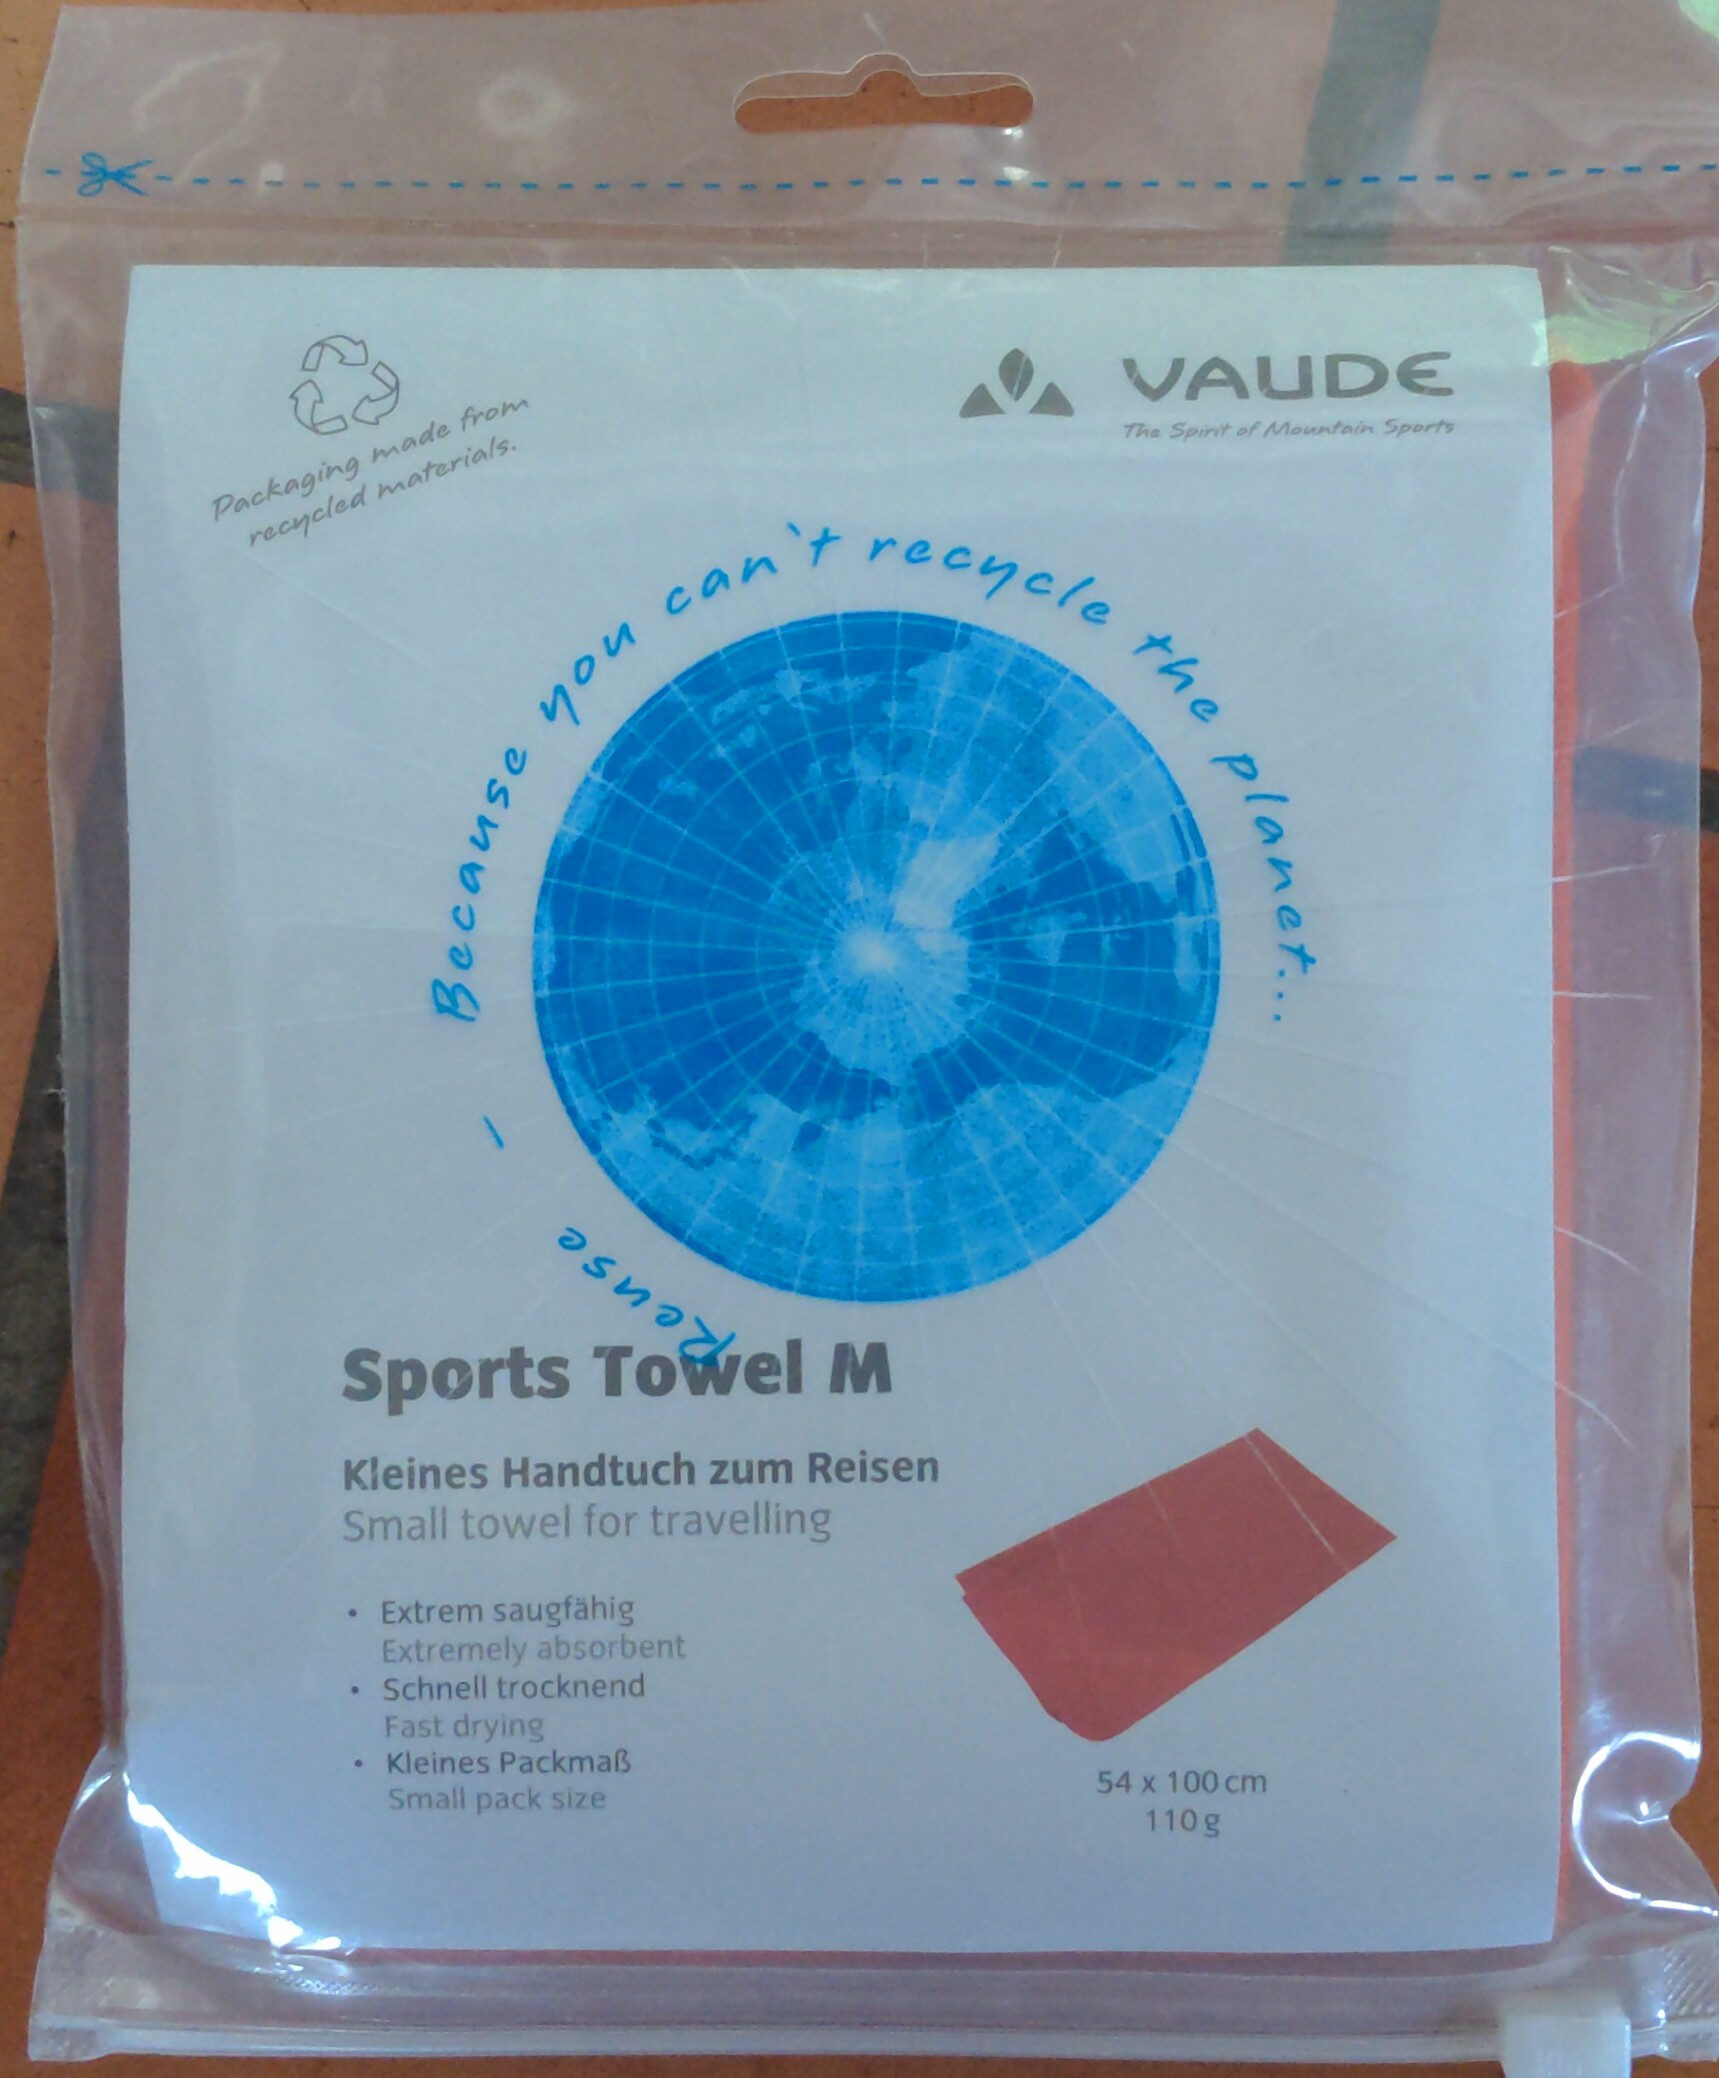 Sports Towel M - Product - en